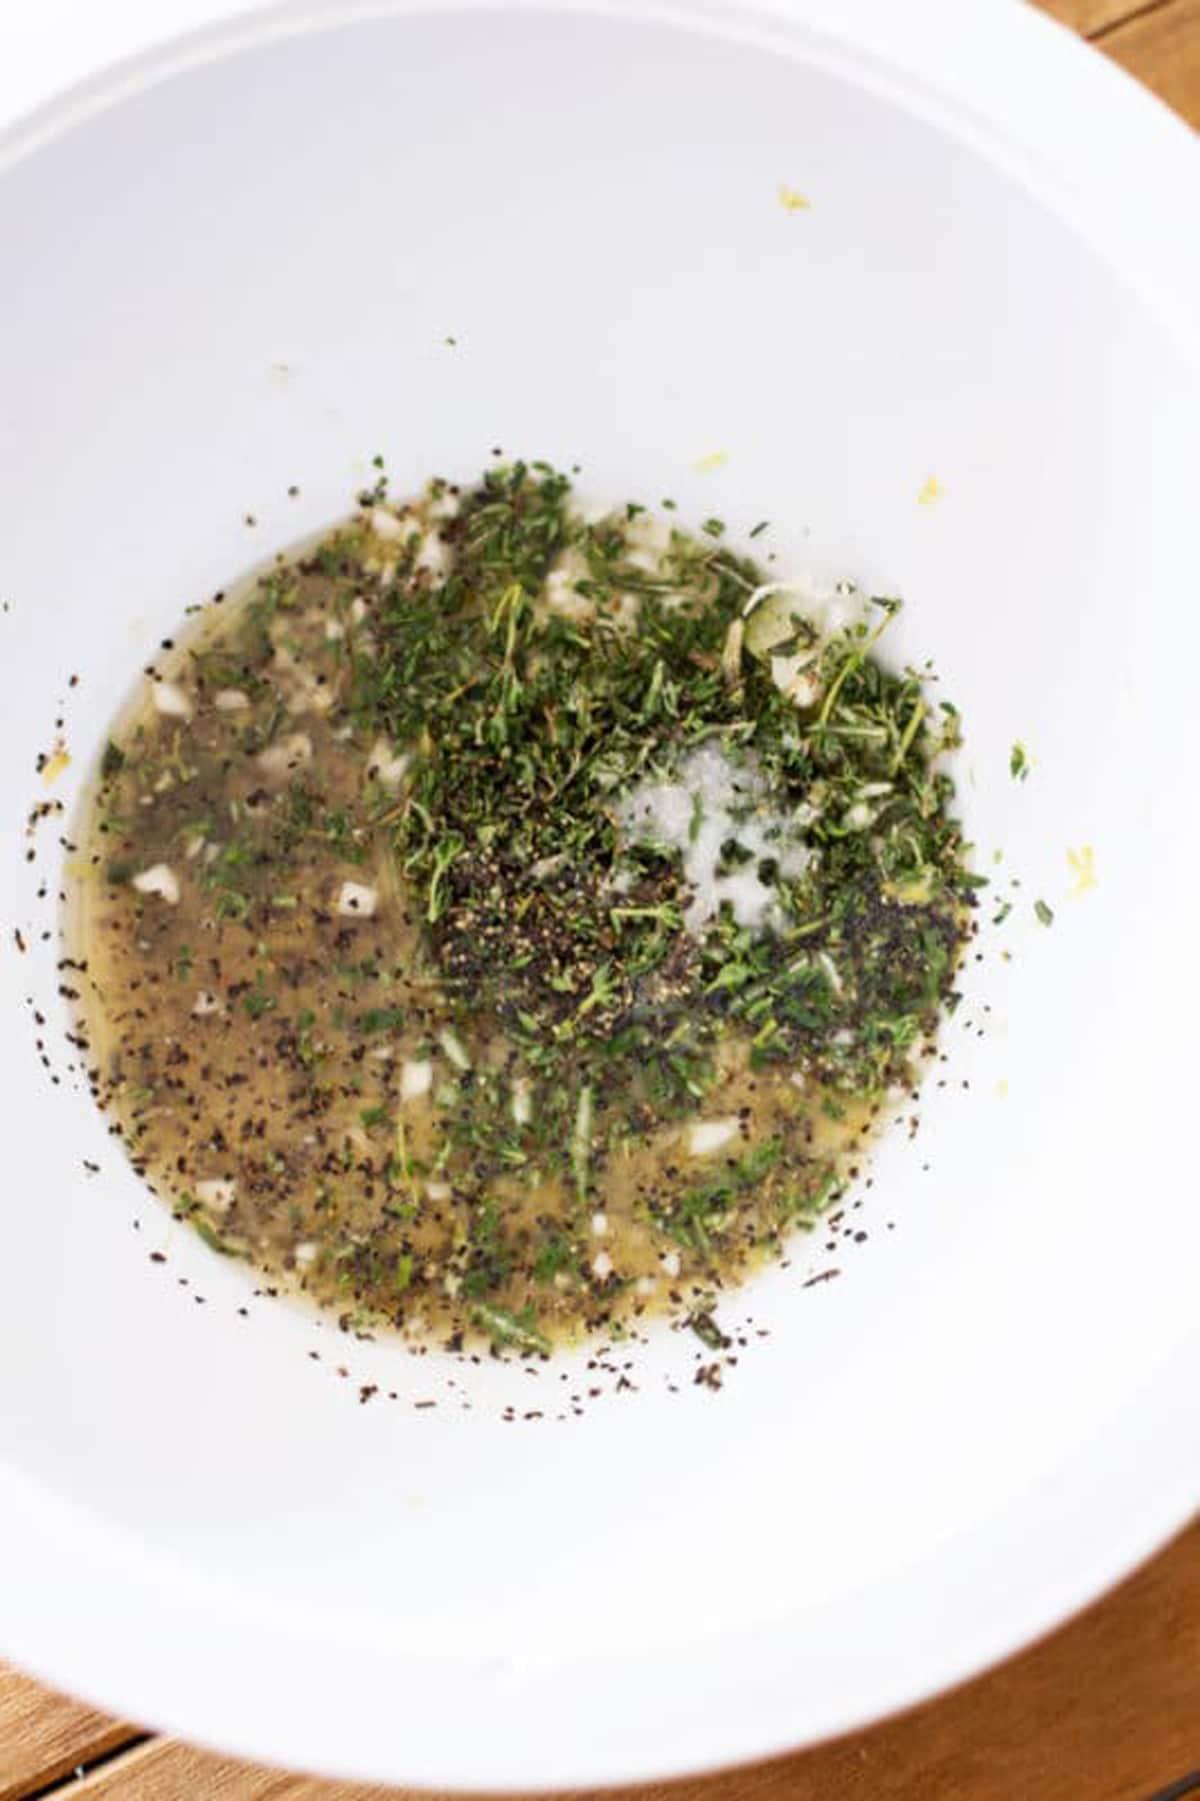 White bowl containing lemon juice, rosemary, thyme, salt and pepper for a Lemon Garlic Thyme Chicken recipe.